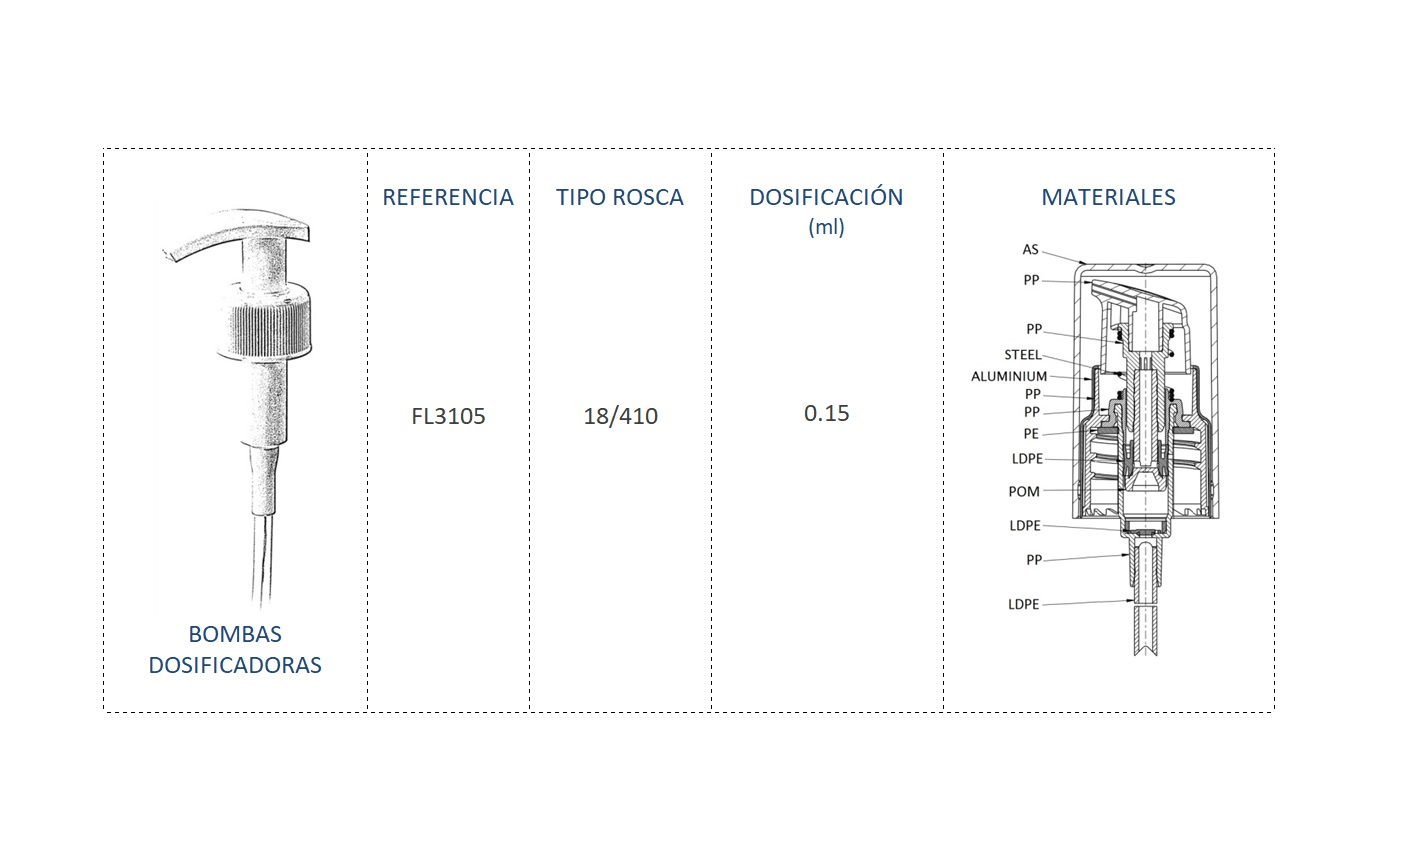 Cuadro de materiales bomba dosificadora FL3105 18/410